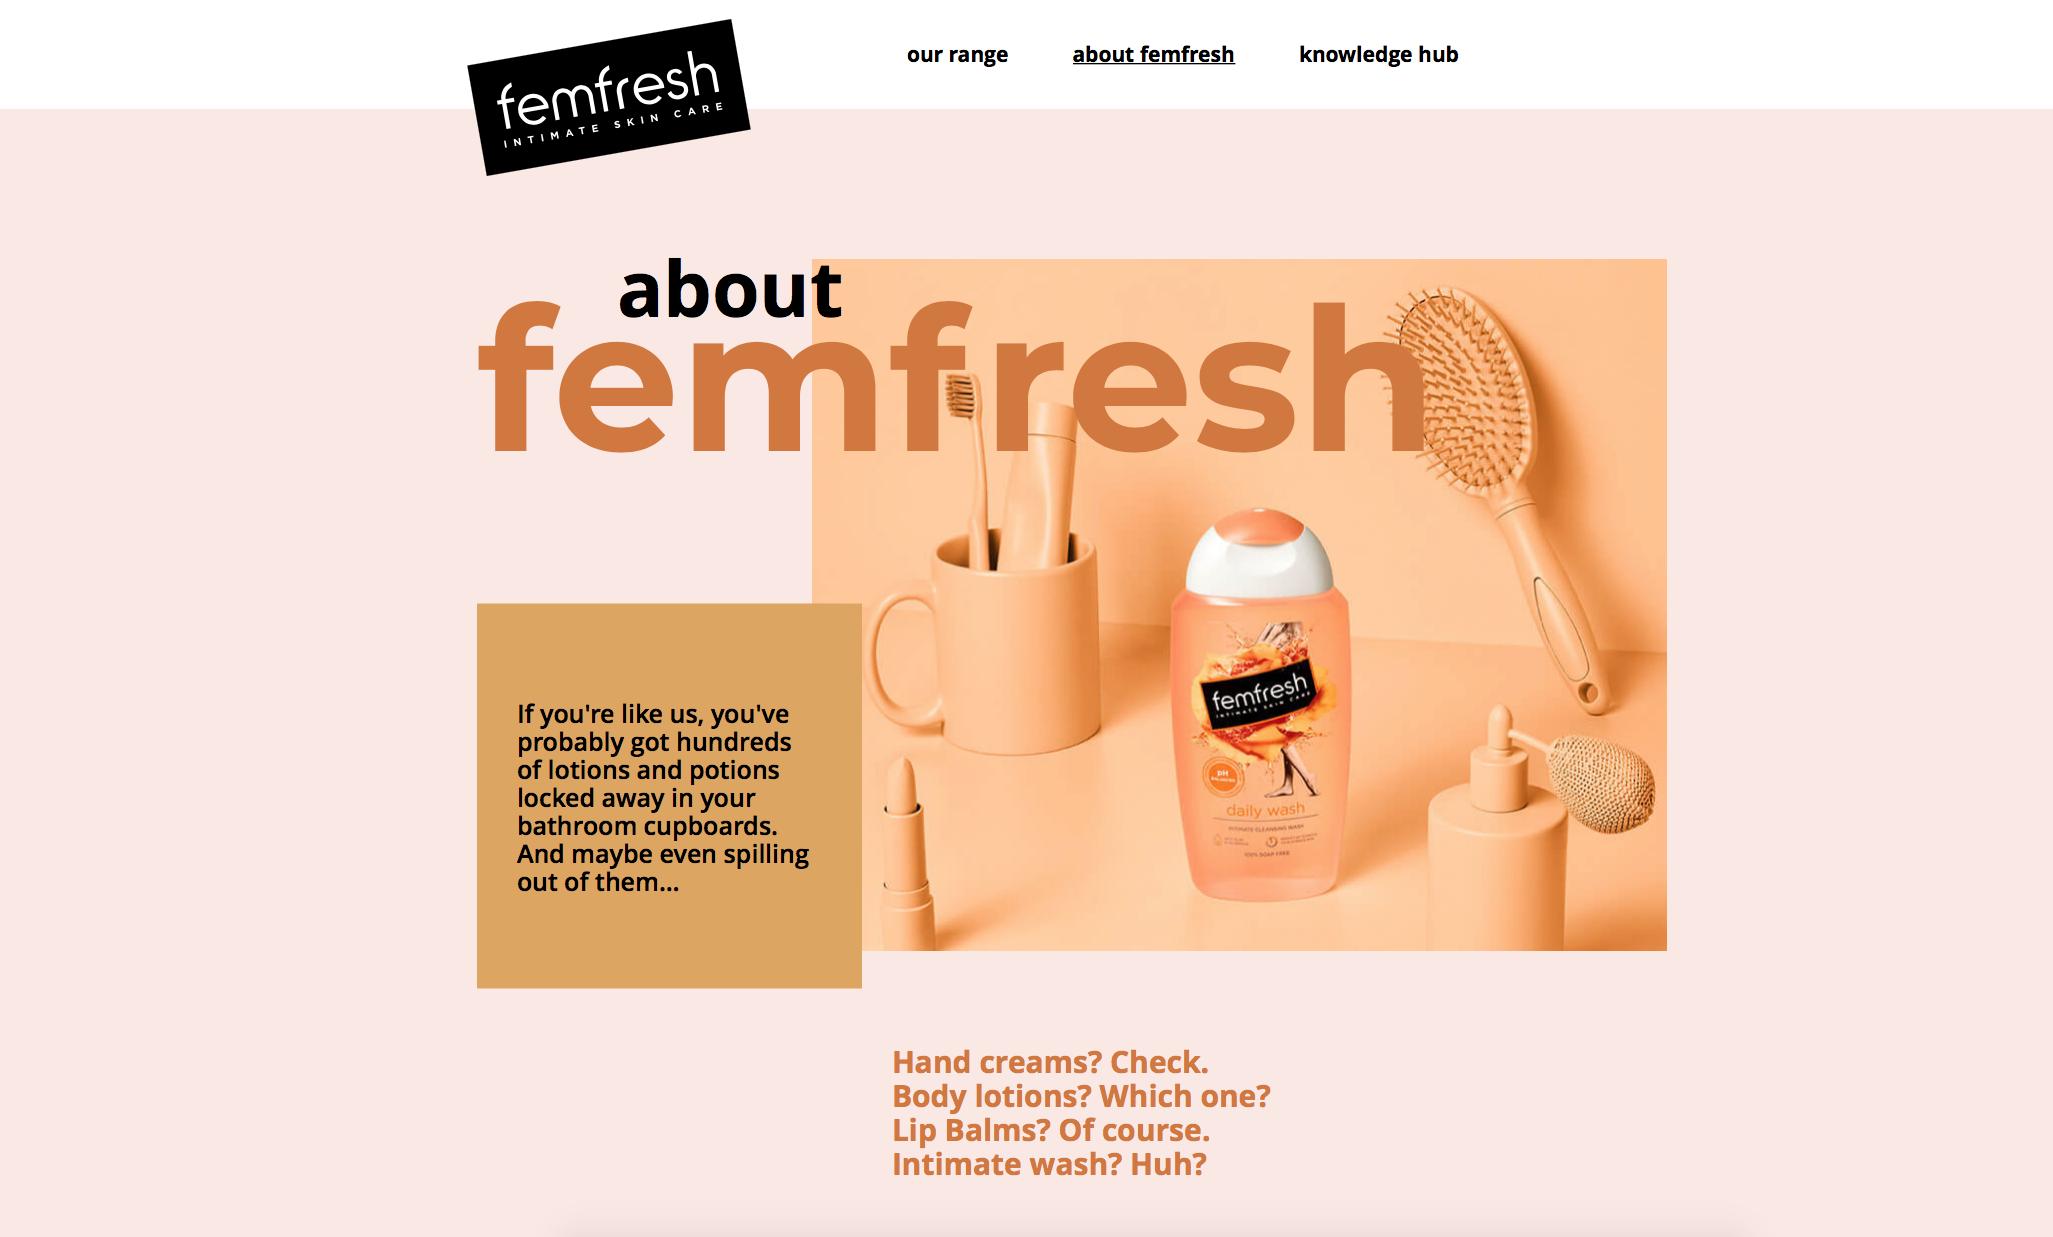 about femfresh web page